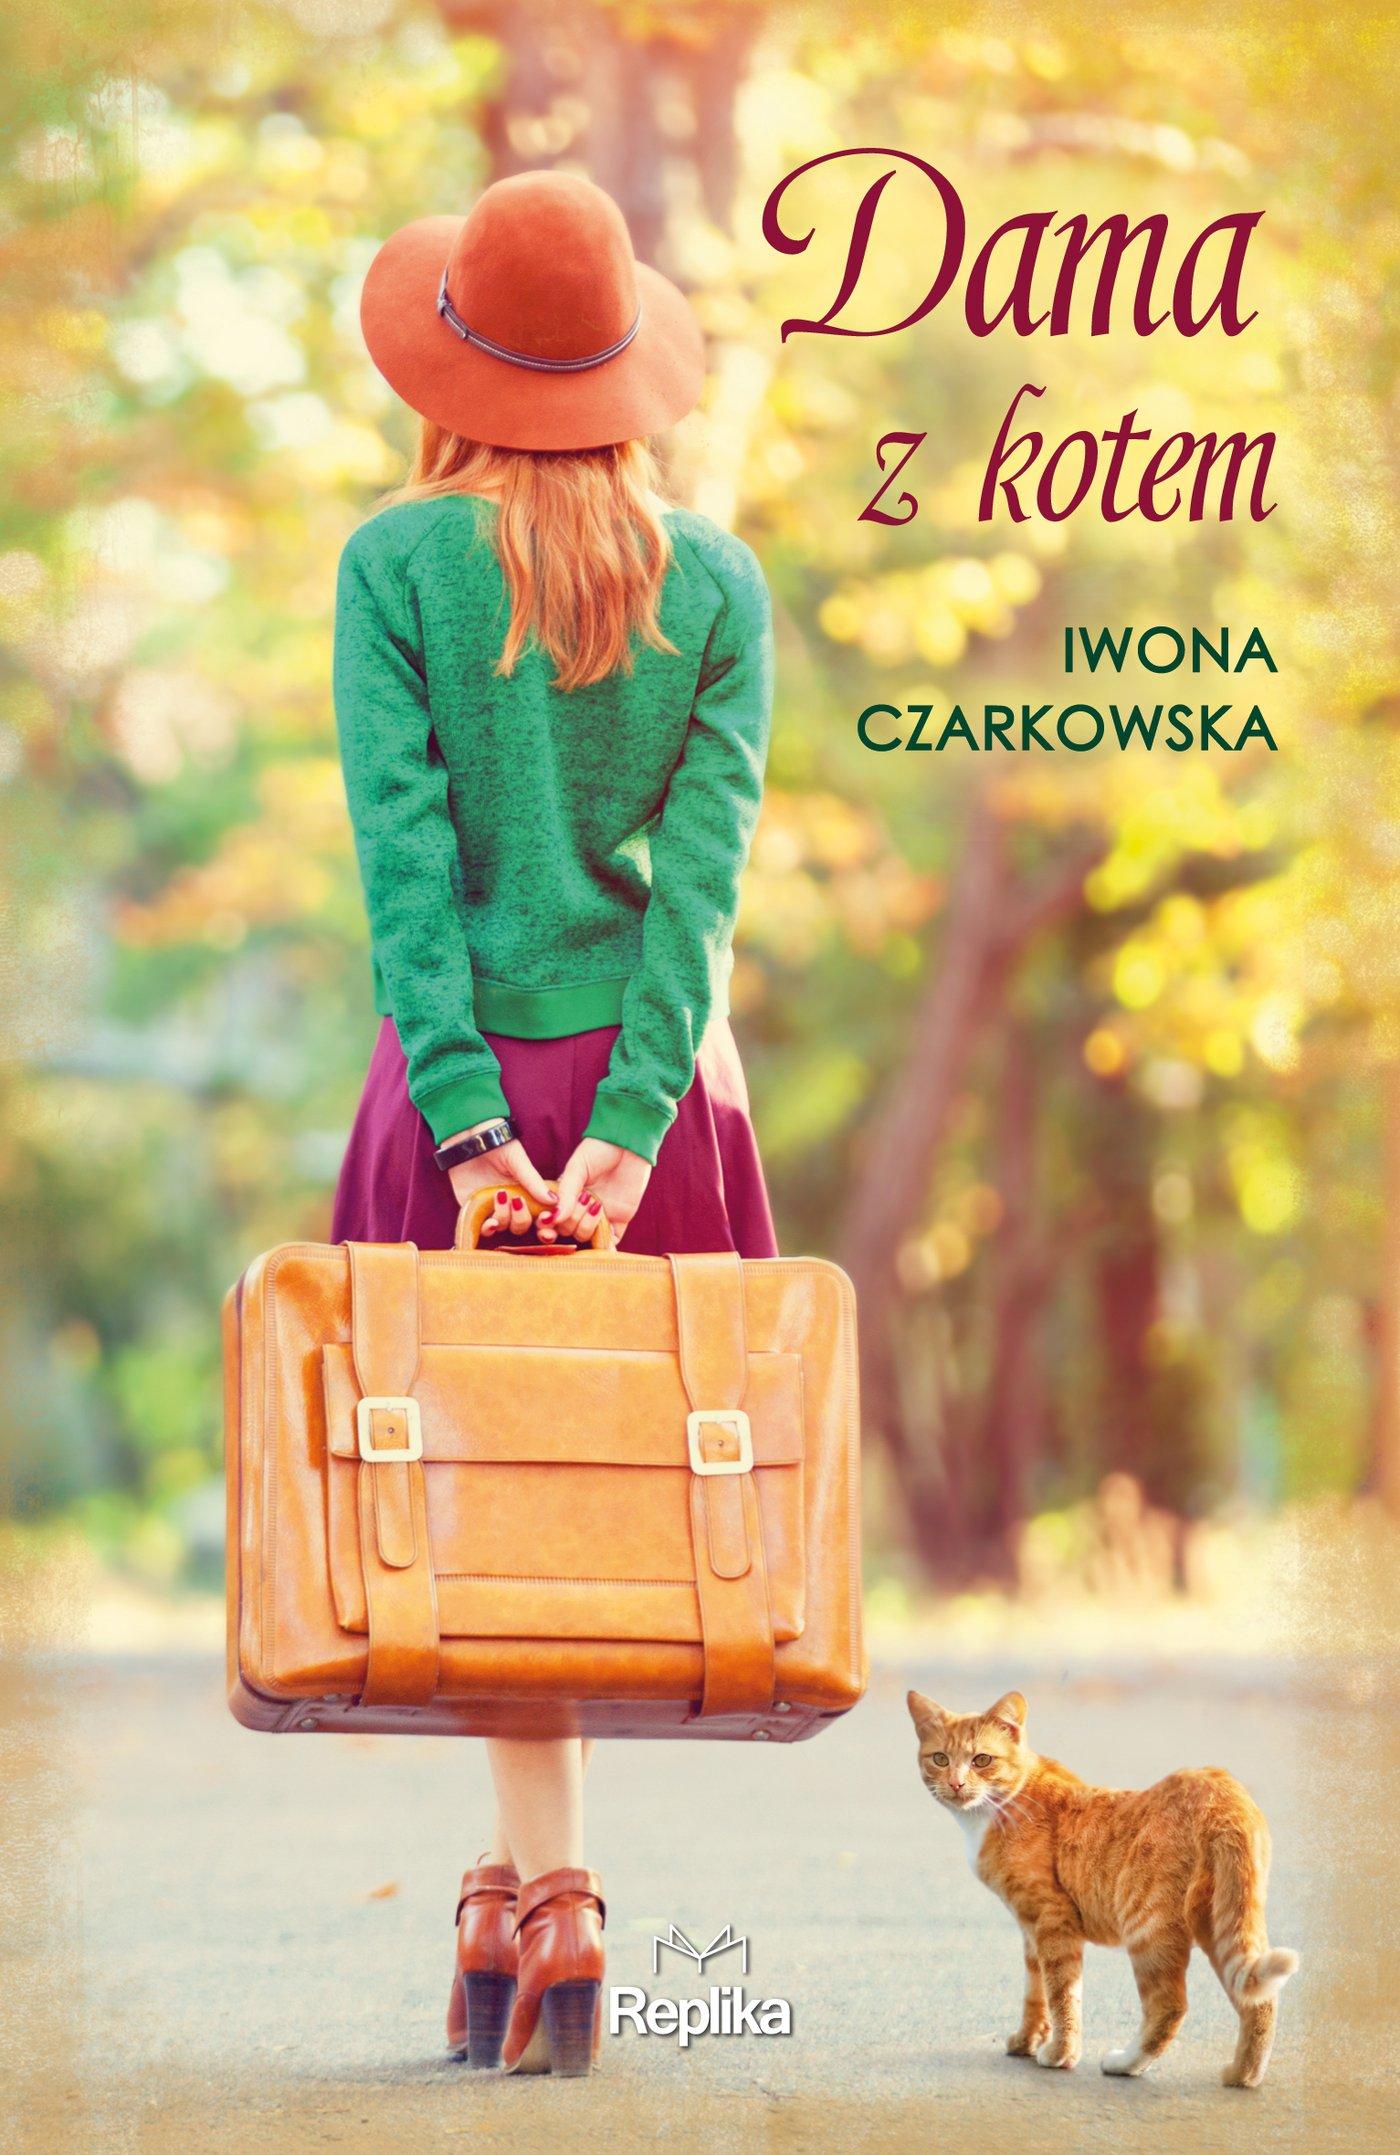 Dama z kotem - Ebook (Książka na Kindle) do pobrania w formacie MOBI